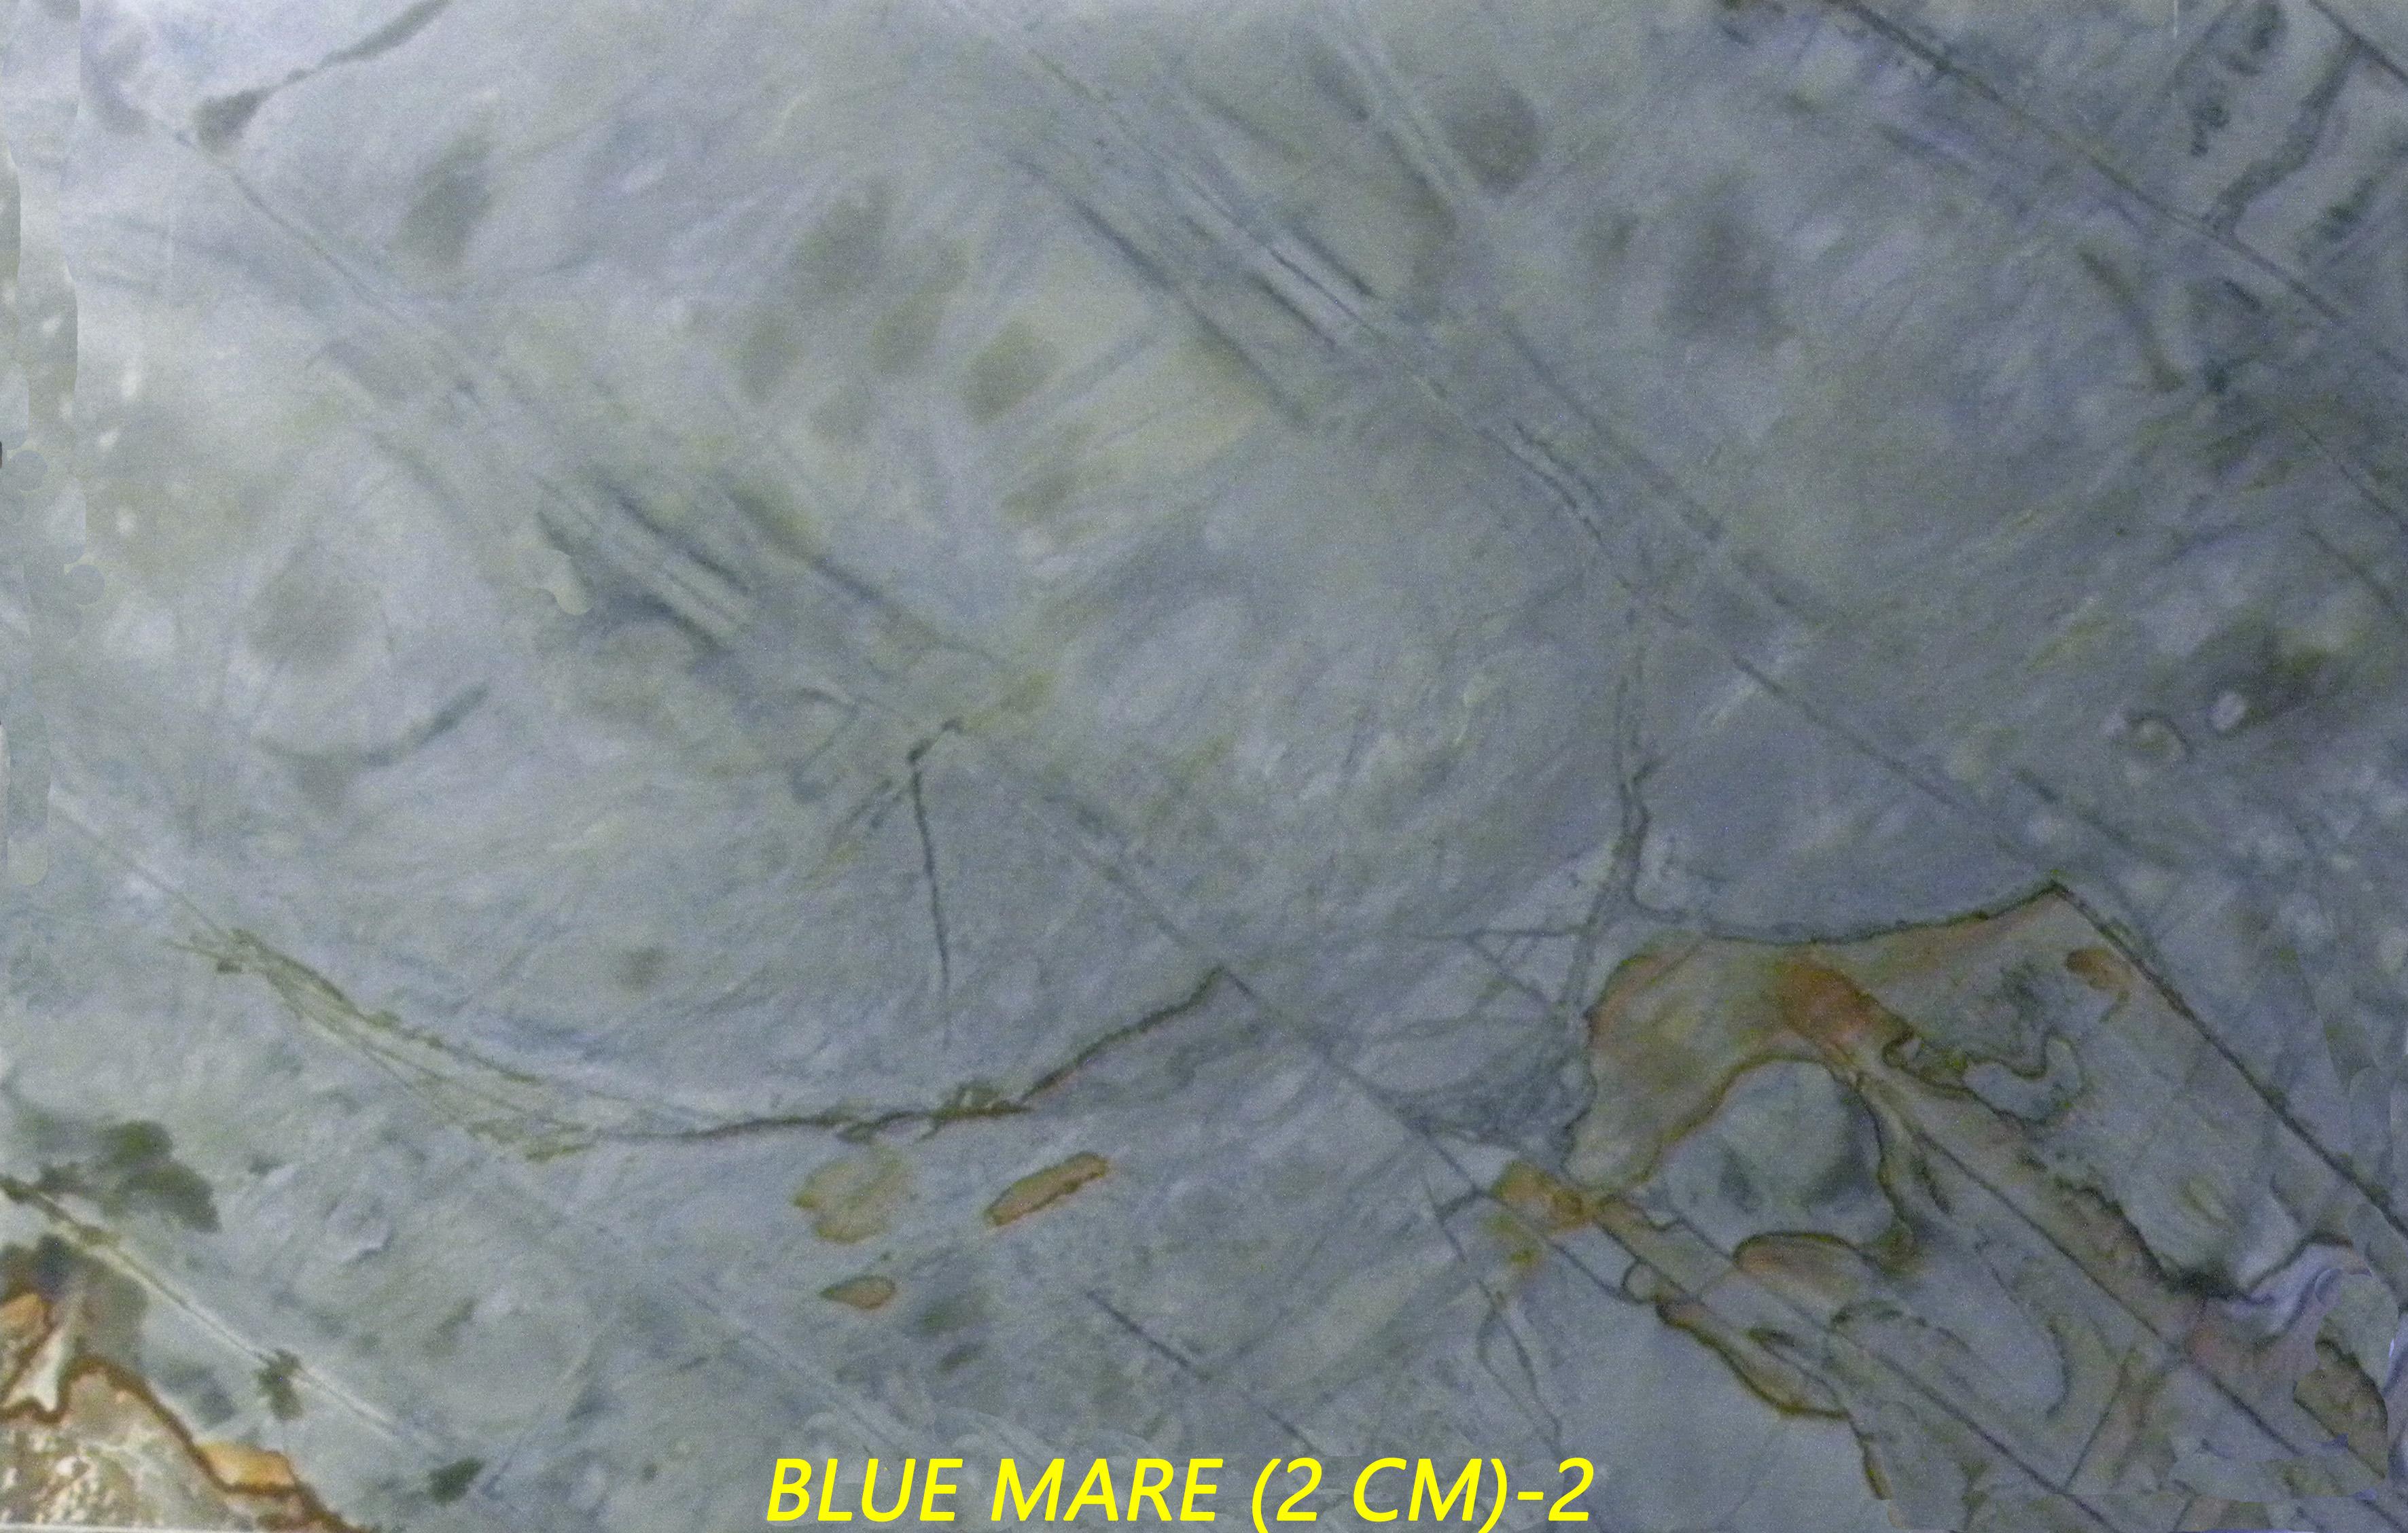 BLUE MARE (2 CM)-#109332.JPG